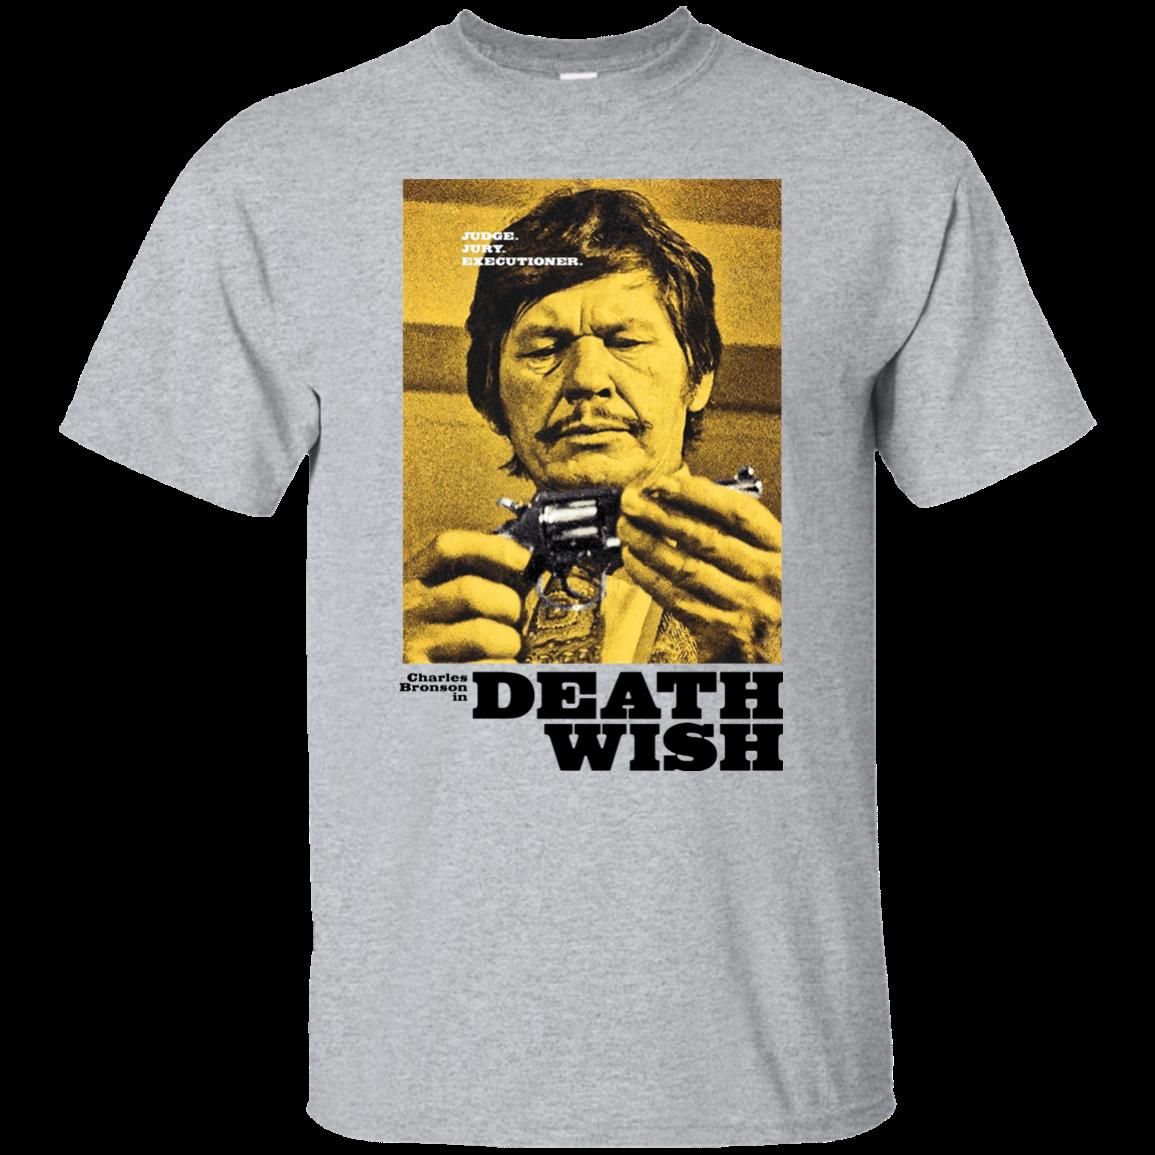 Death Wish, Charles Bronson, Retro, Vigilante, Movie, crime, 1970's, seventies Harajuku Tops Fashion Classic Unique t-Shirt